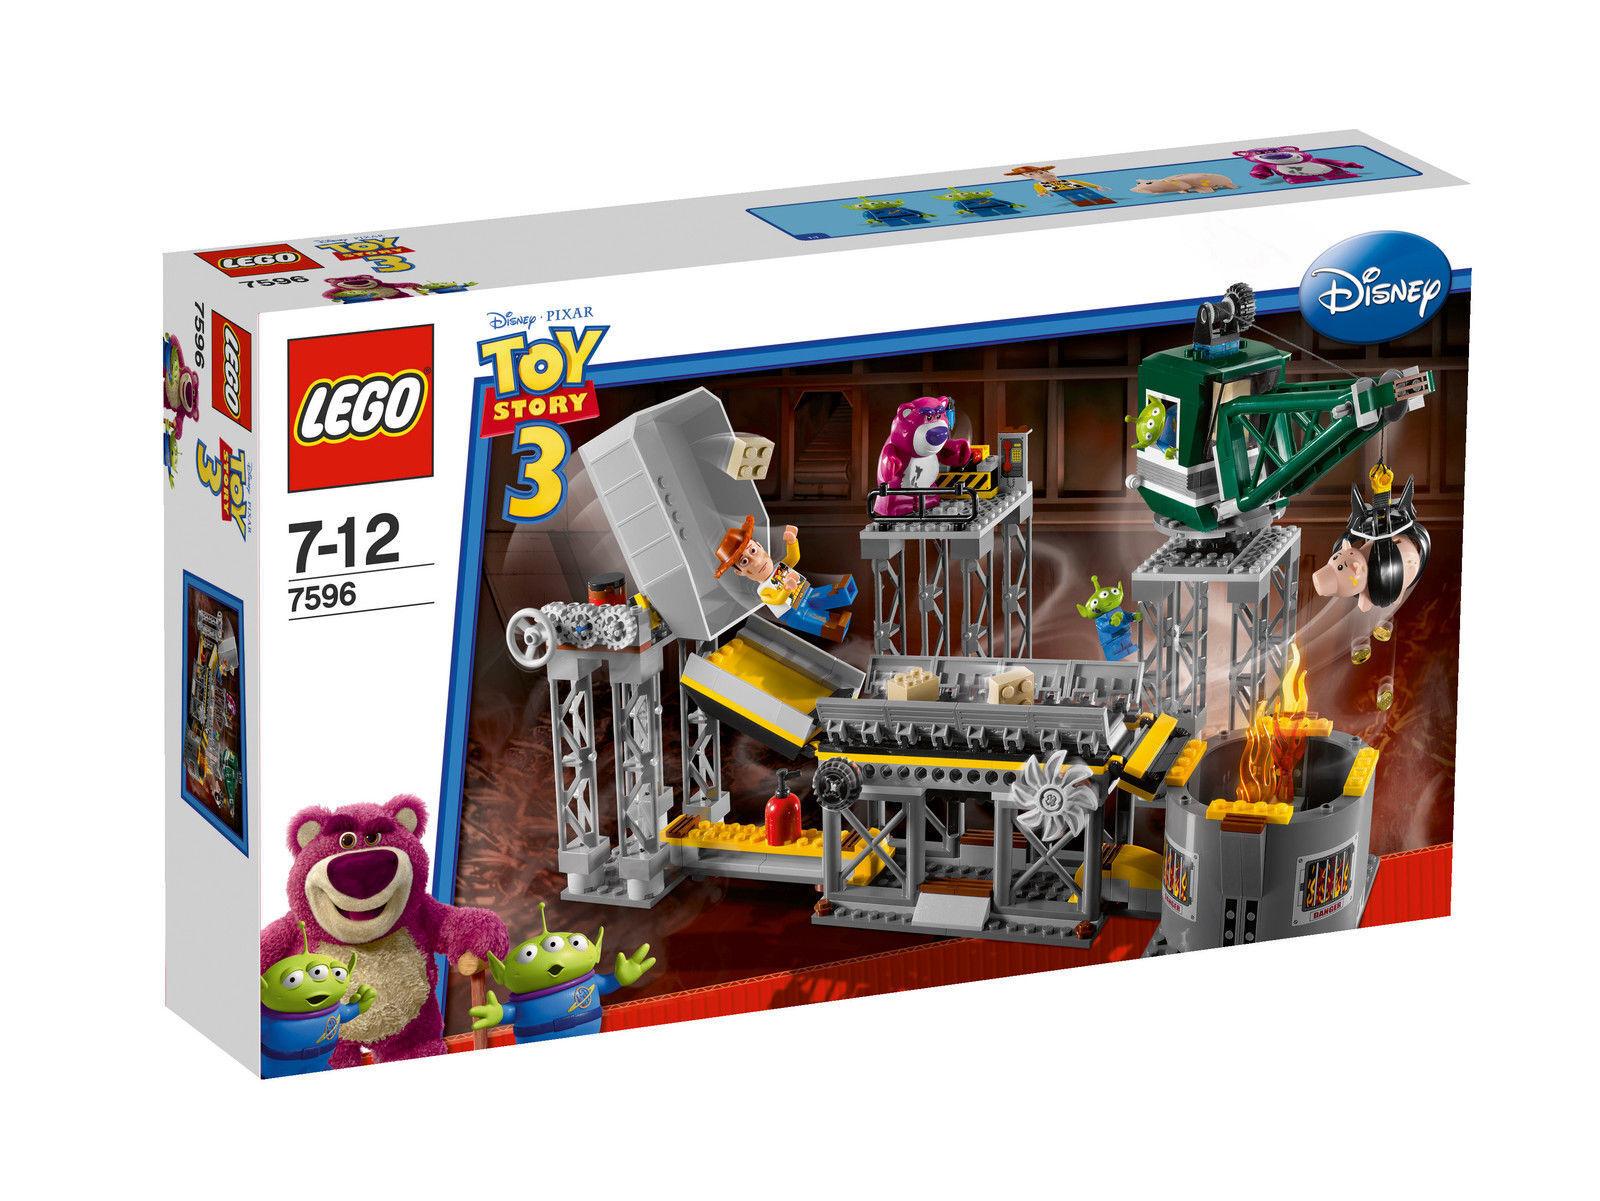 LEGO Toy Story Flucht aus der Müllpresse (7596) Neu & OVP